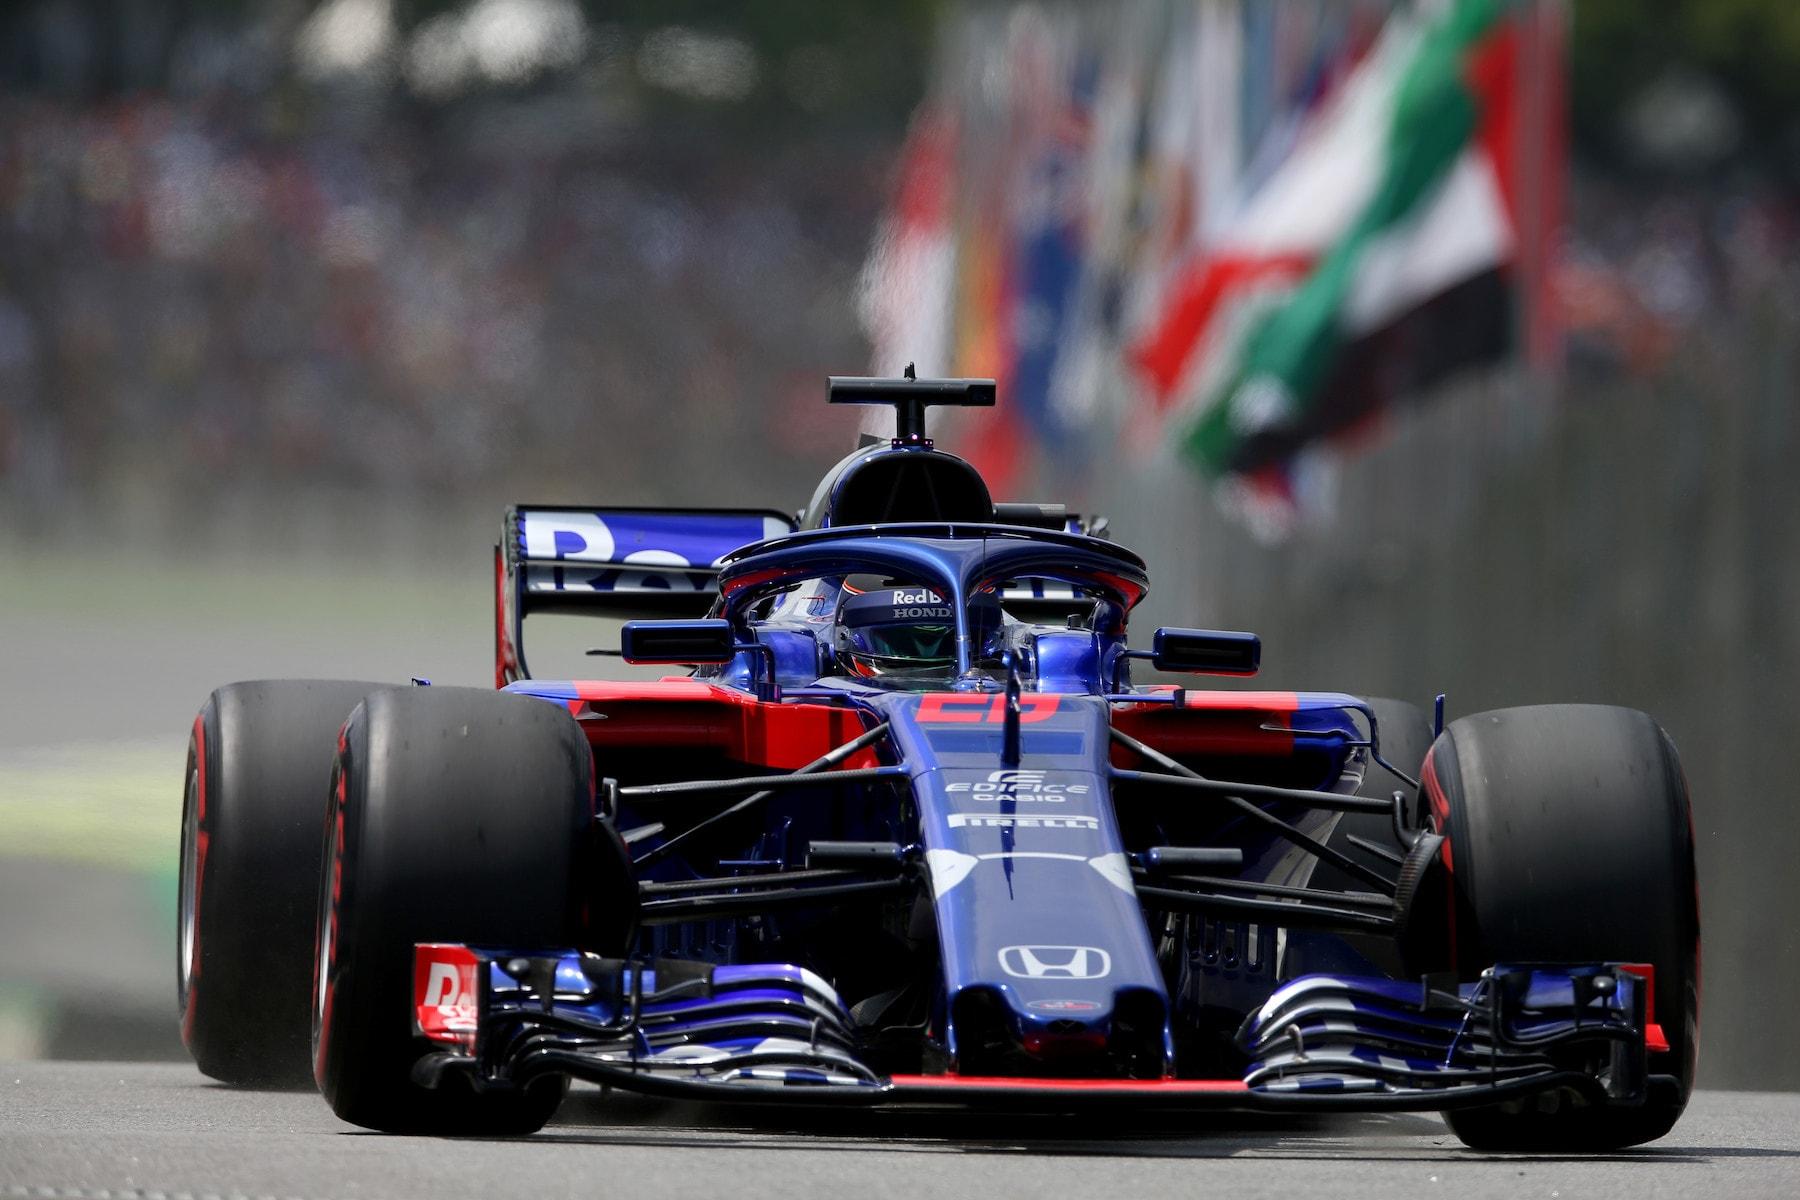 H 2018 Brendon Hartley | Toro Rosso STR13 | 2018 Brazilian GP 2 copy.jpg